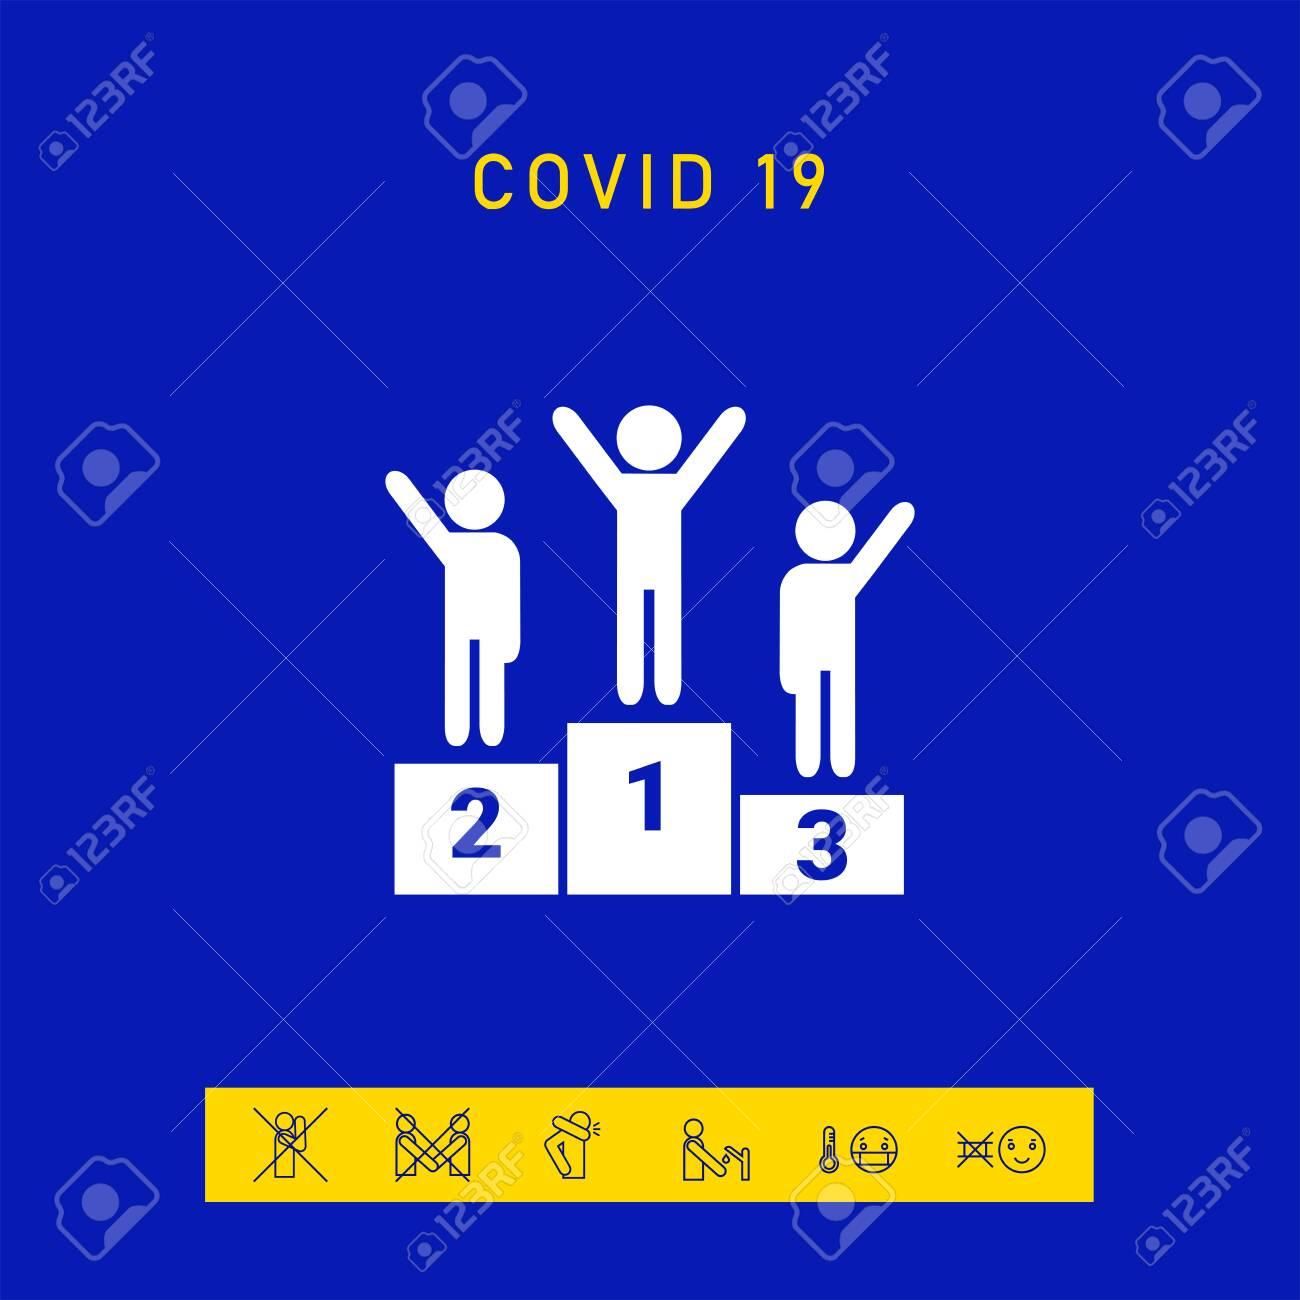 Pedestal podium icon, elements for your design - 144755146